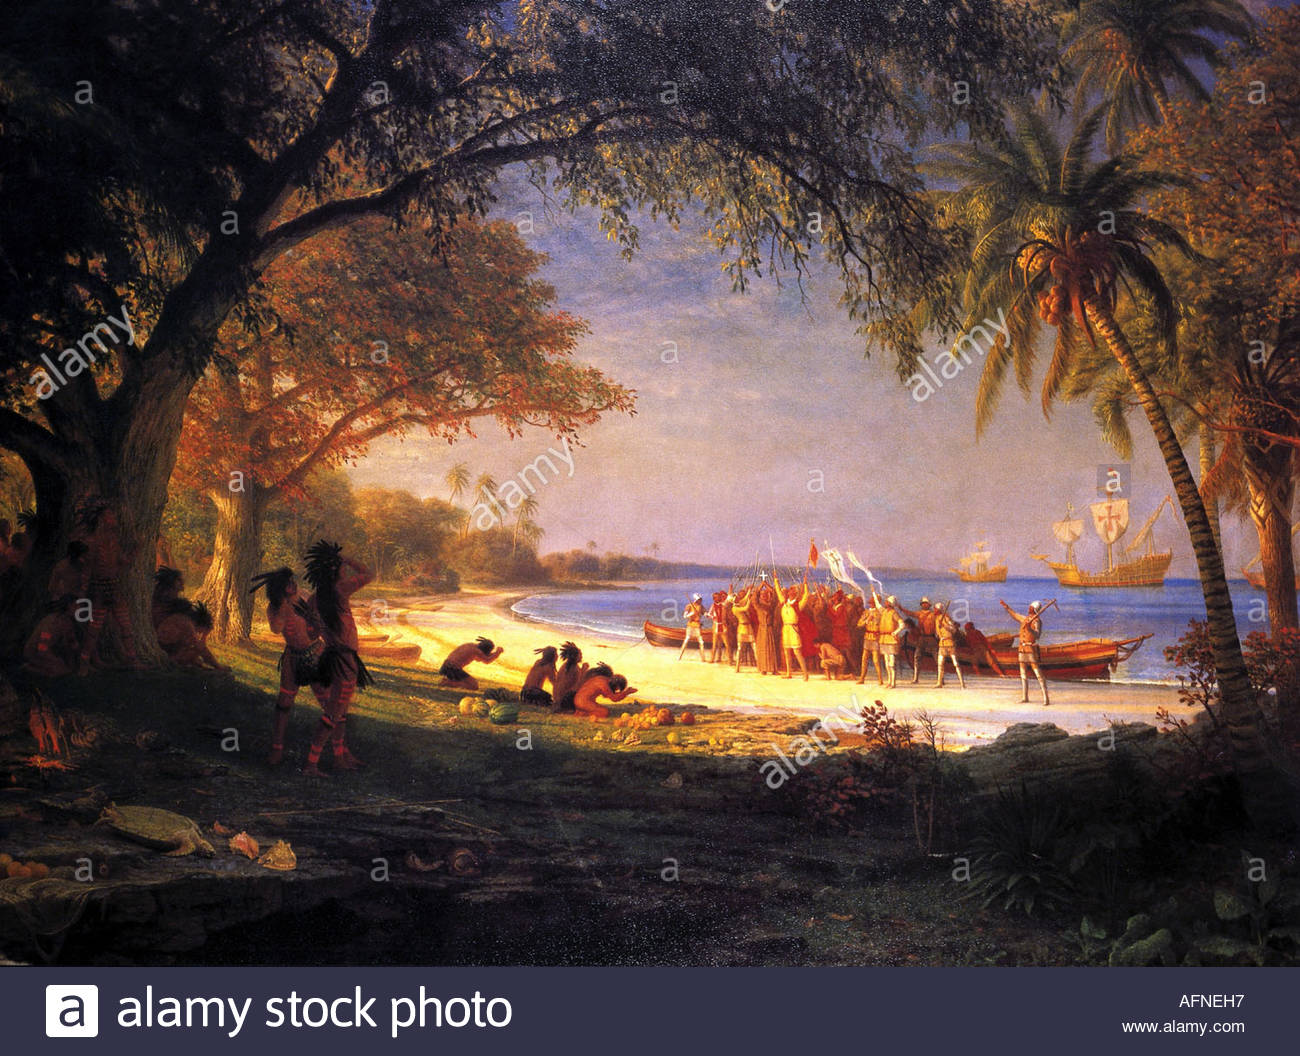 Columbus, Christopher, 1451 - 20.5.1506, Italian explorer, scene, arriving at Guanahani, 12.10.1492, history painting, Stock Photo